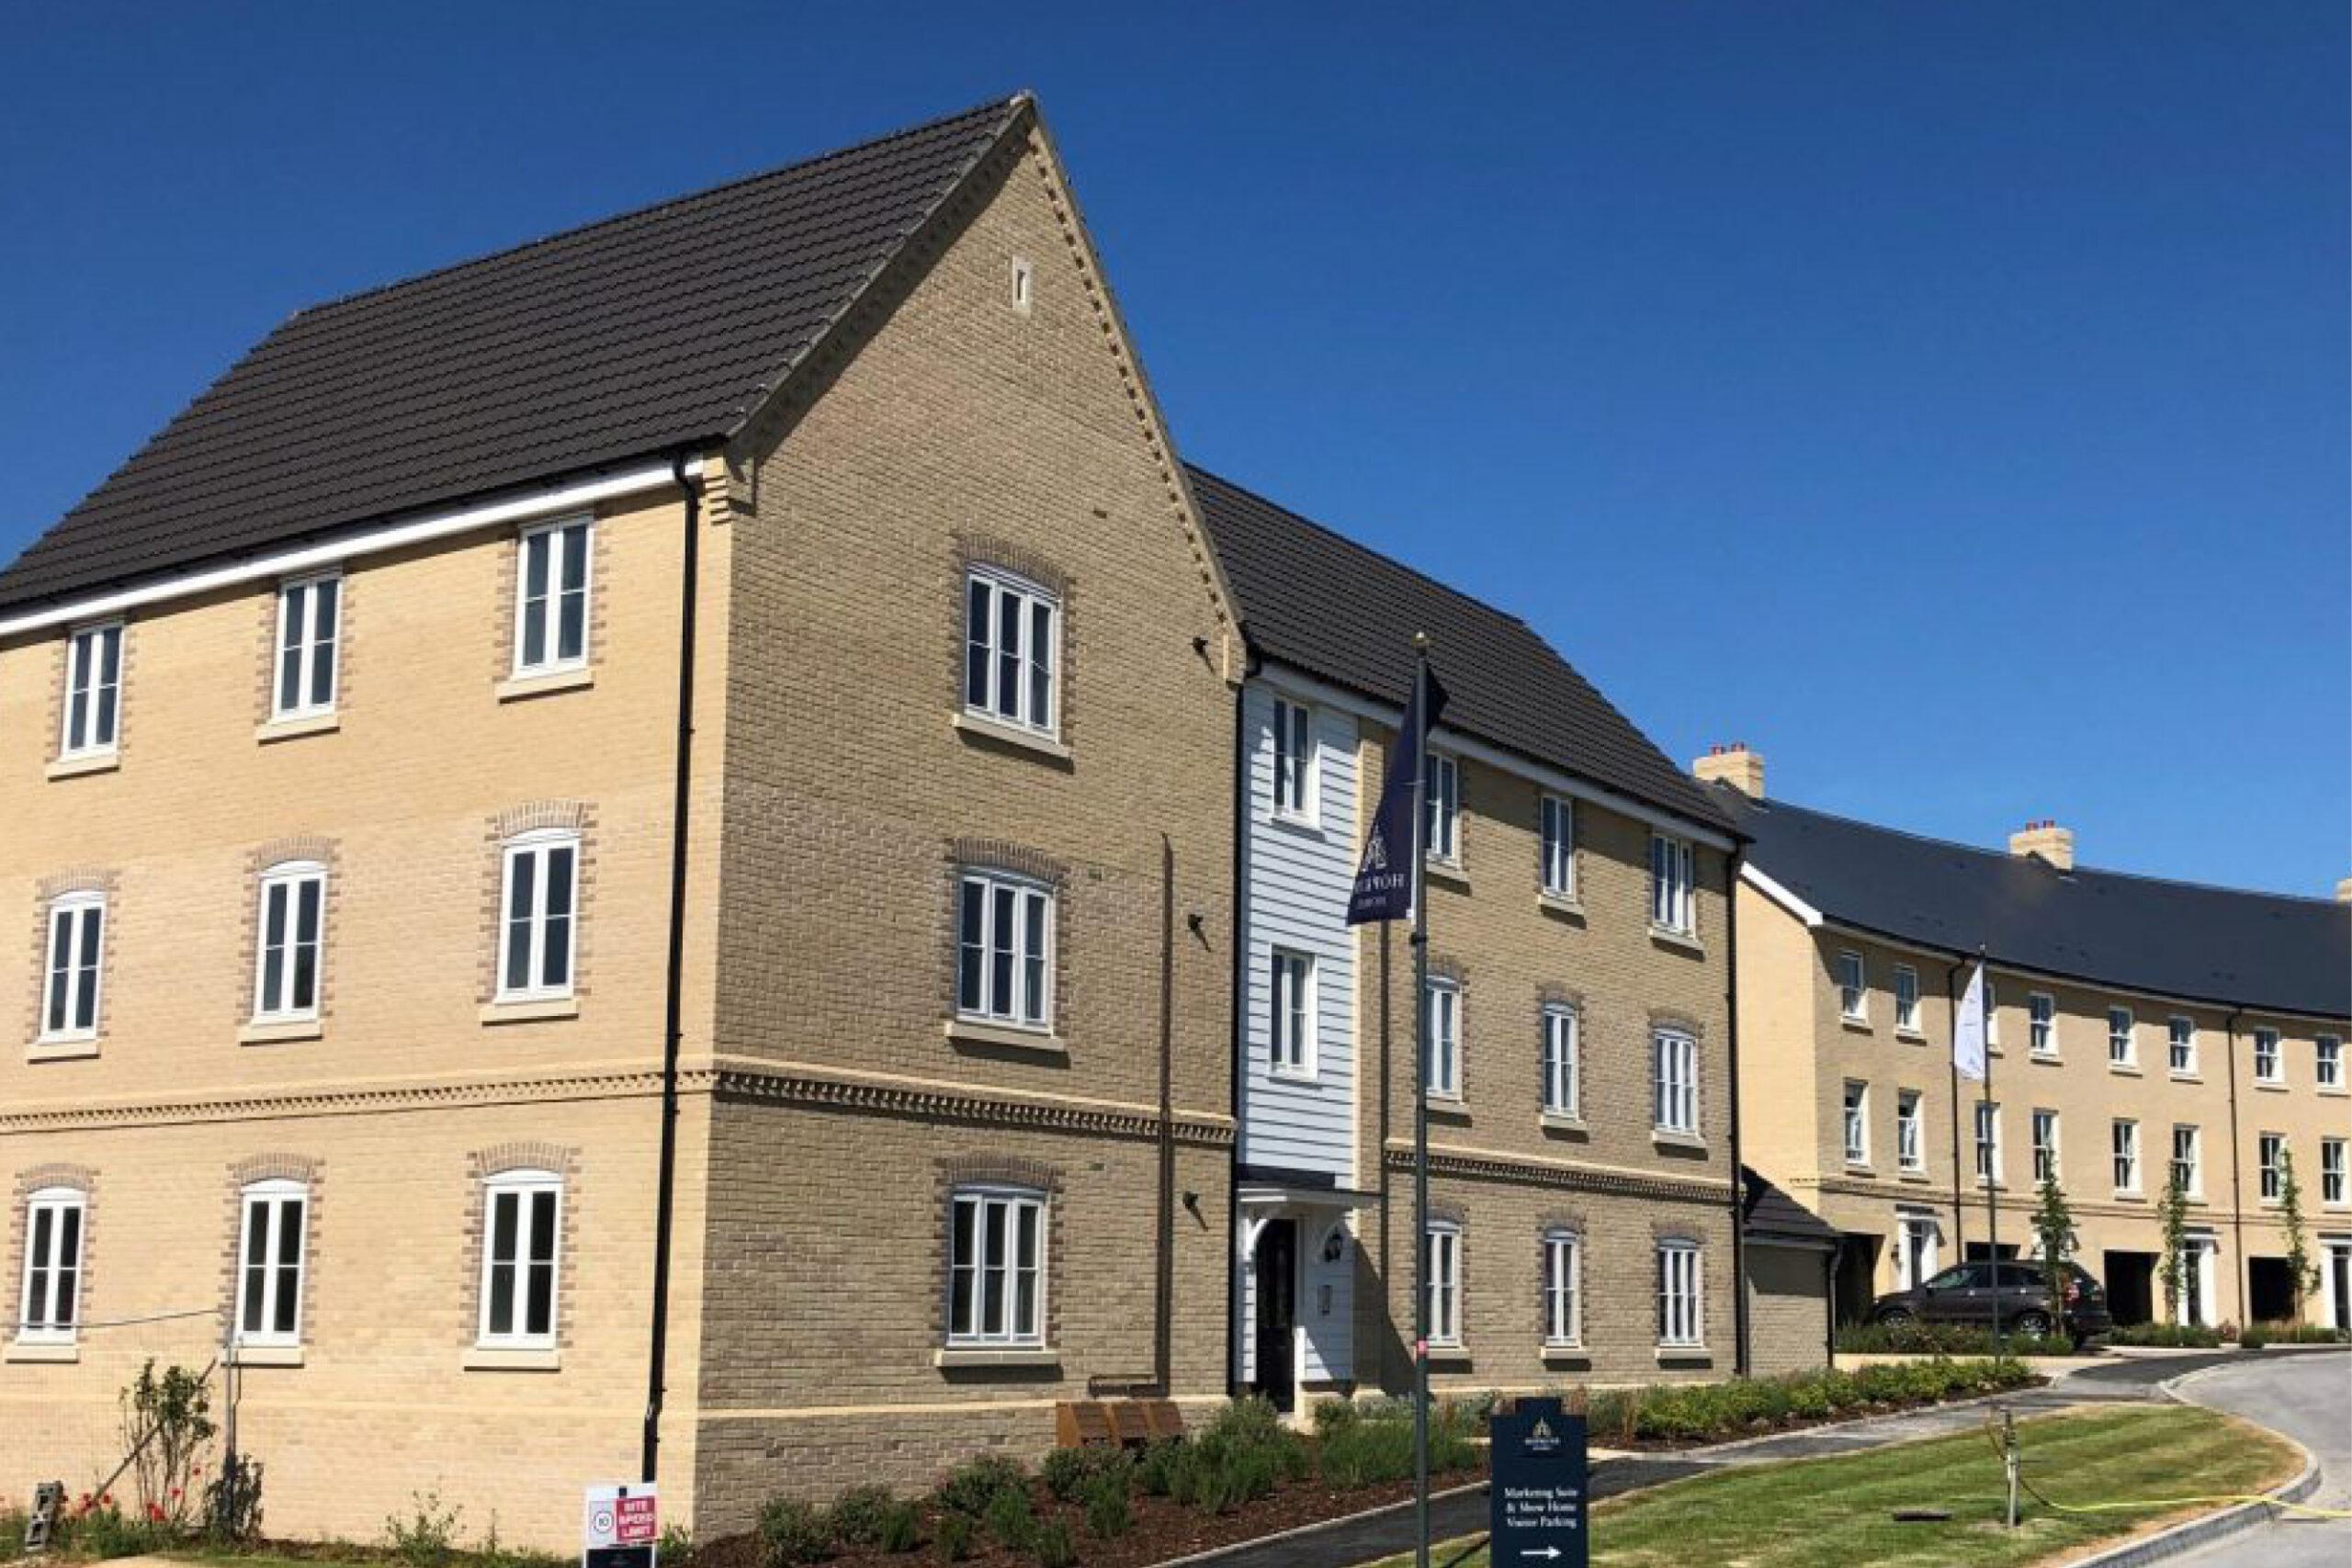 Kingsfleet New Build Homes